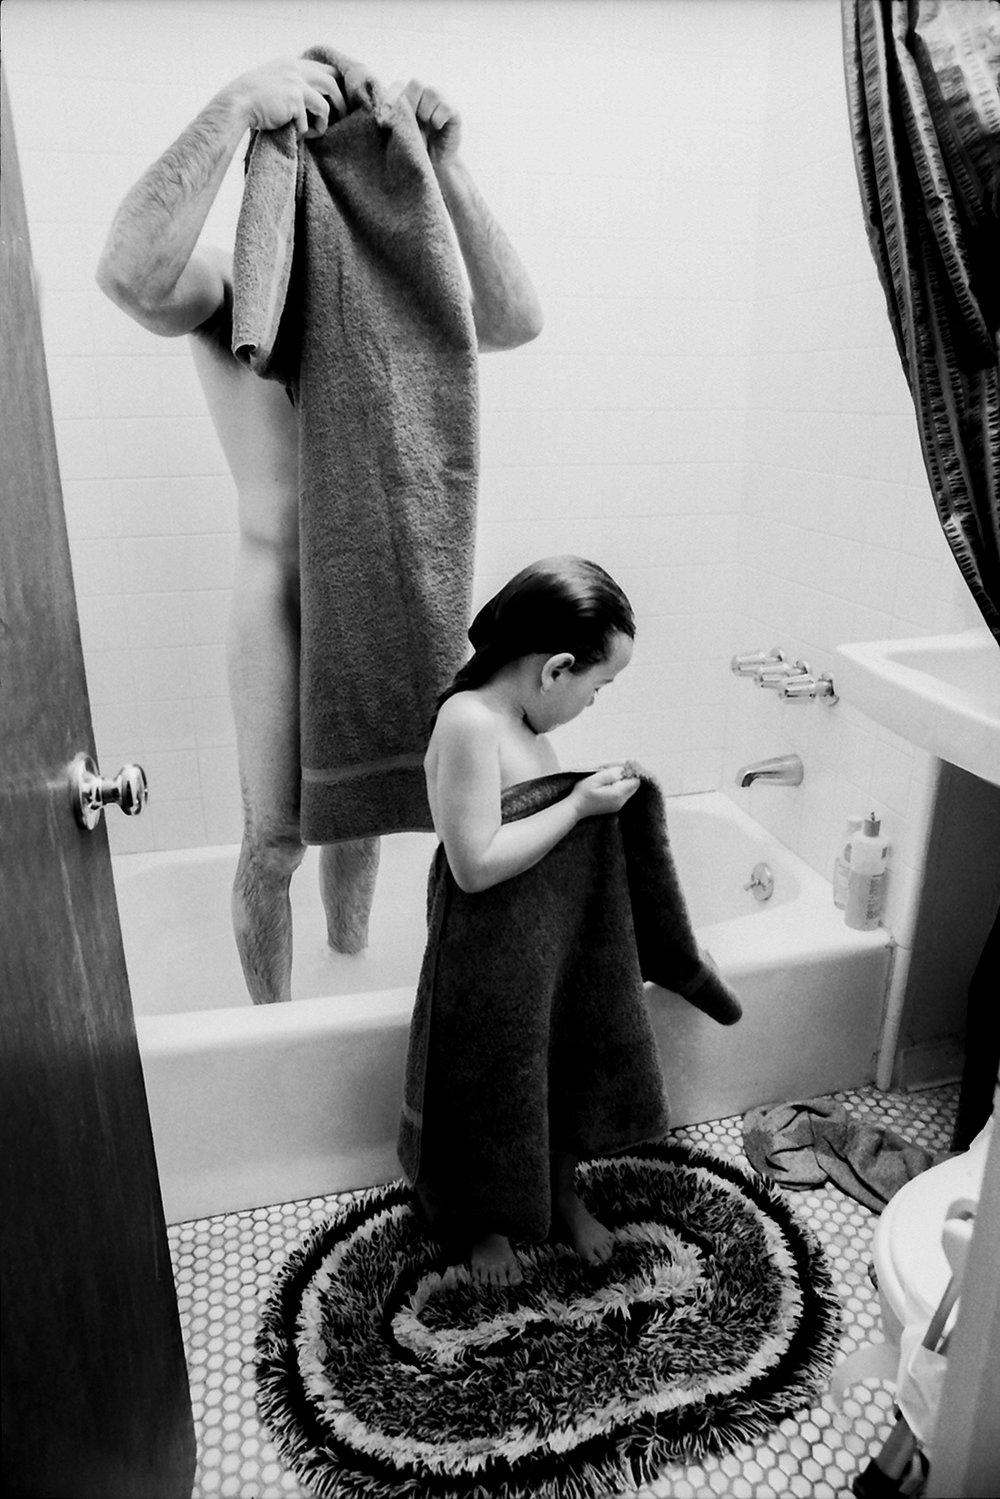 """Bathtime 4"" by Philip Collier"